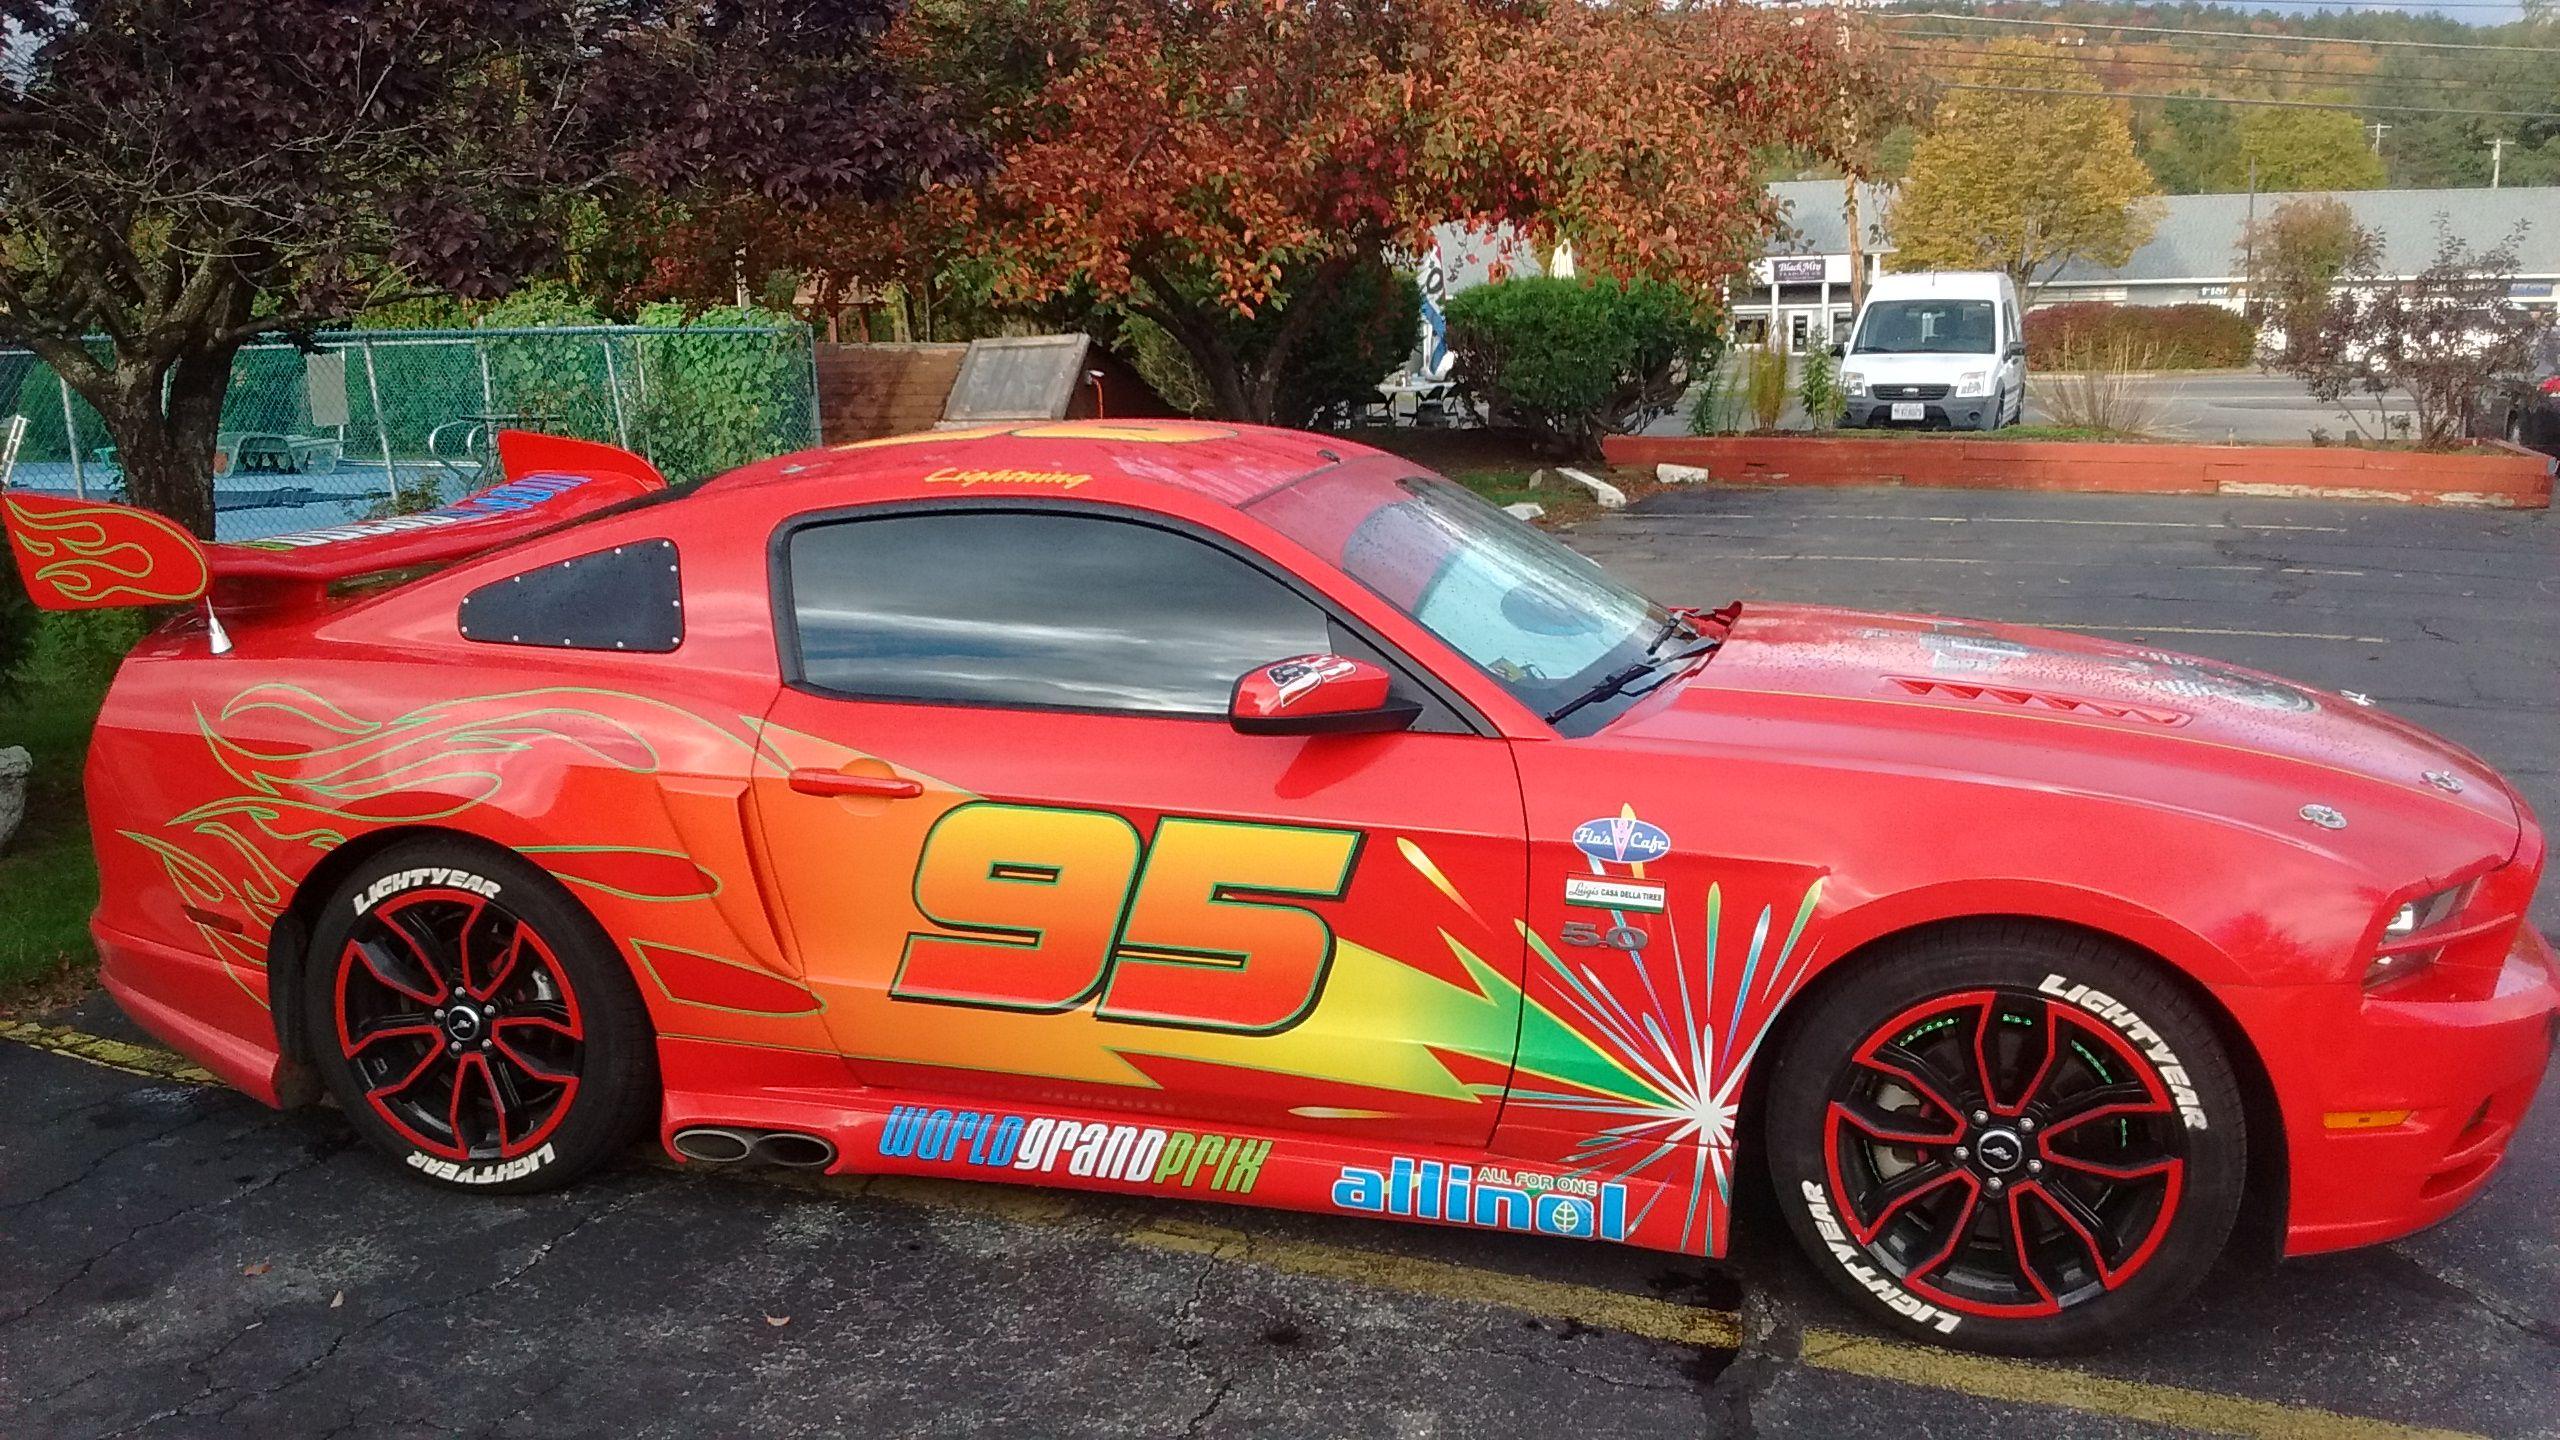 Stock Car Painted Like Lightning Mcqueen